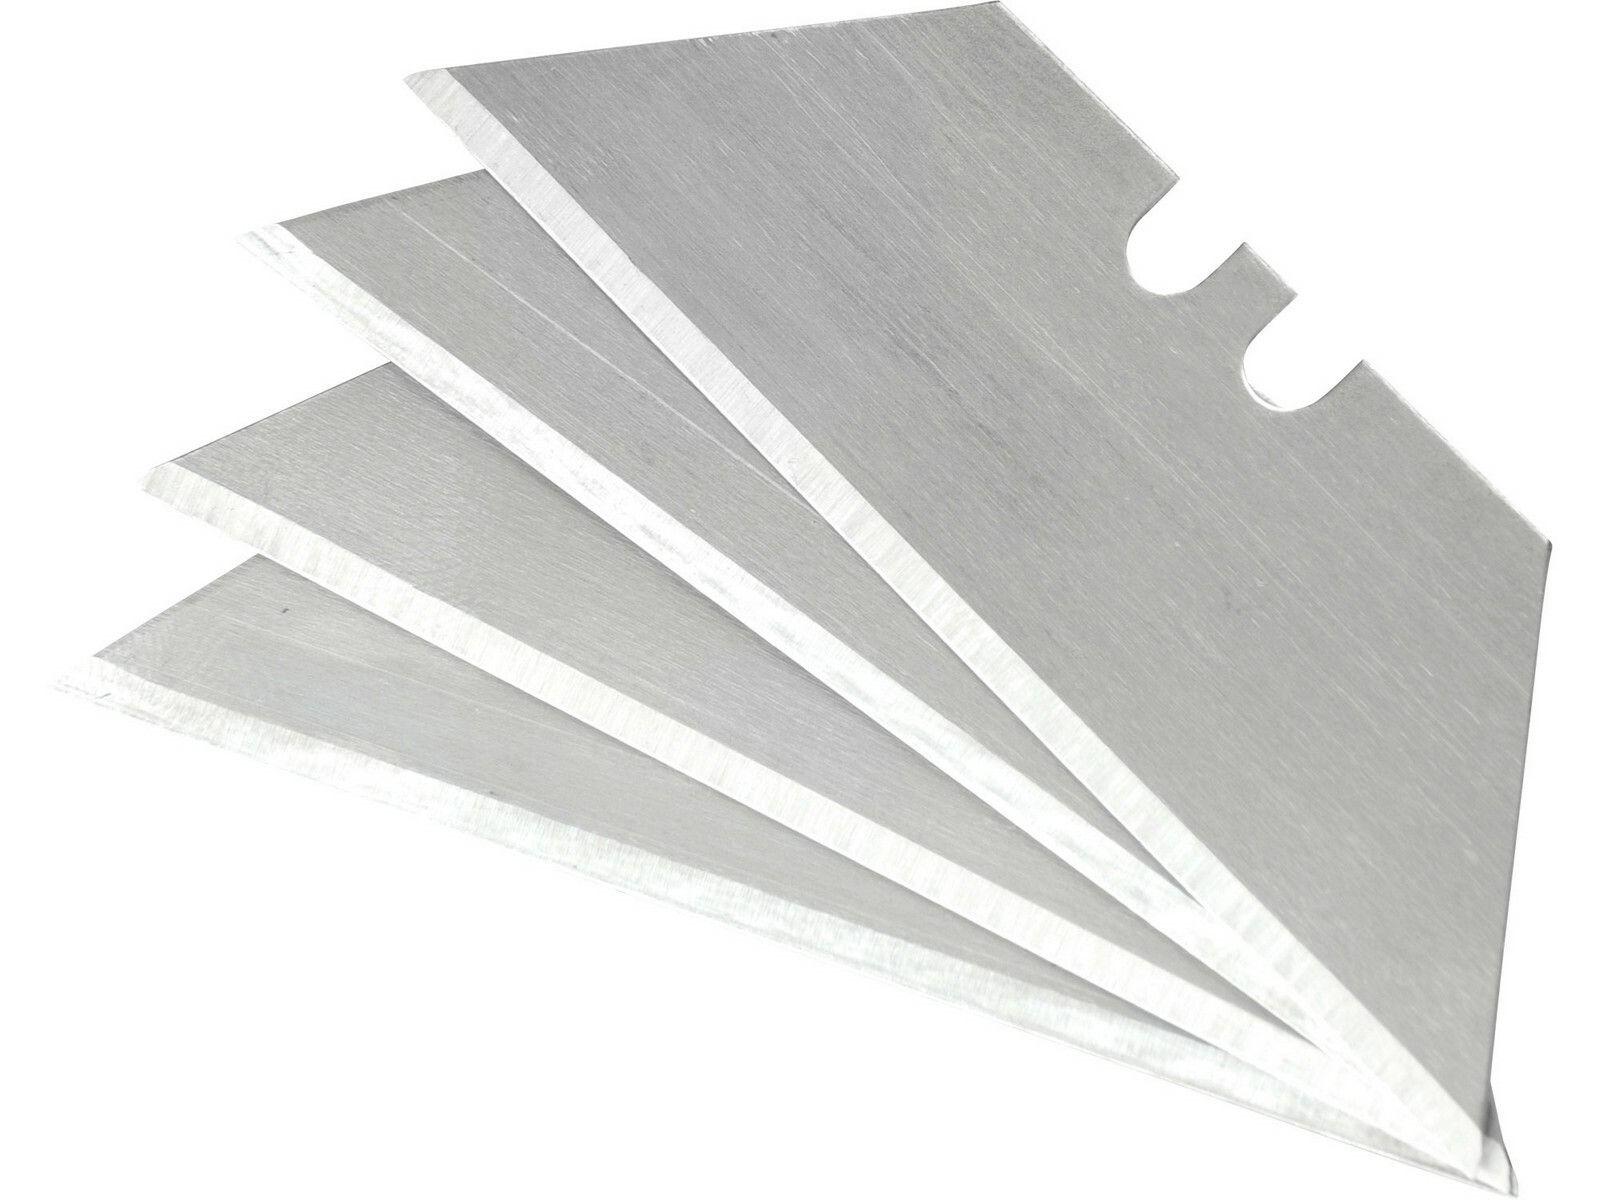 Břity do nože, 19mm, 10ks, trapezoid, SK4 EXTOL PREMIUM